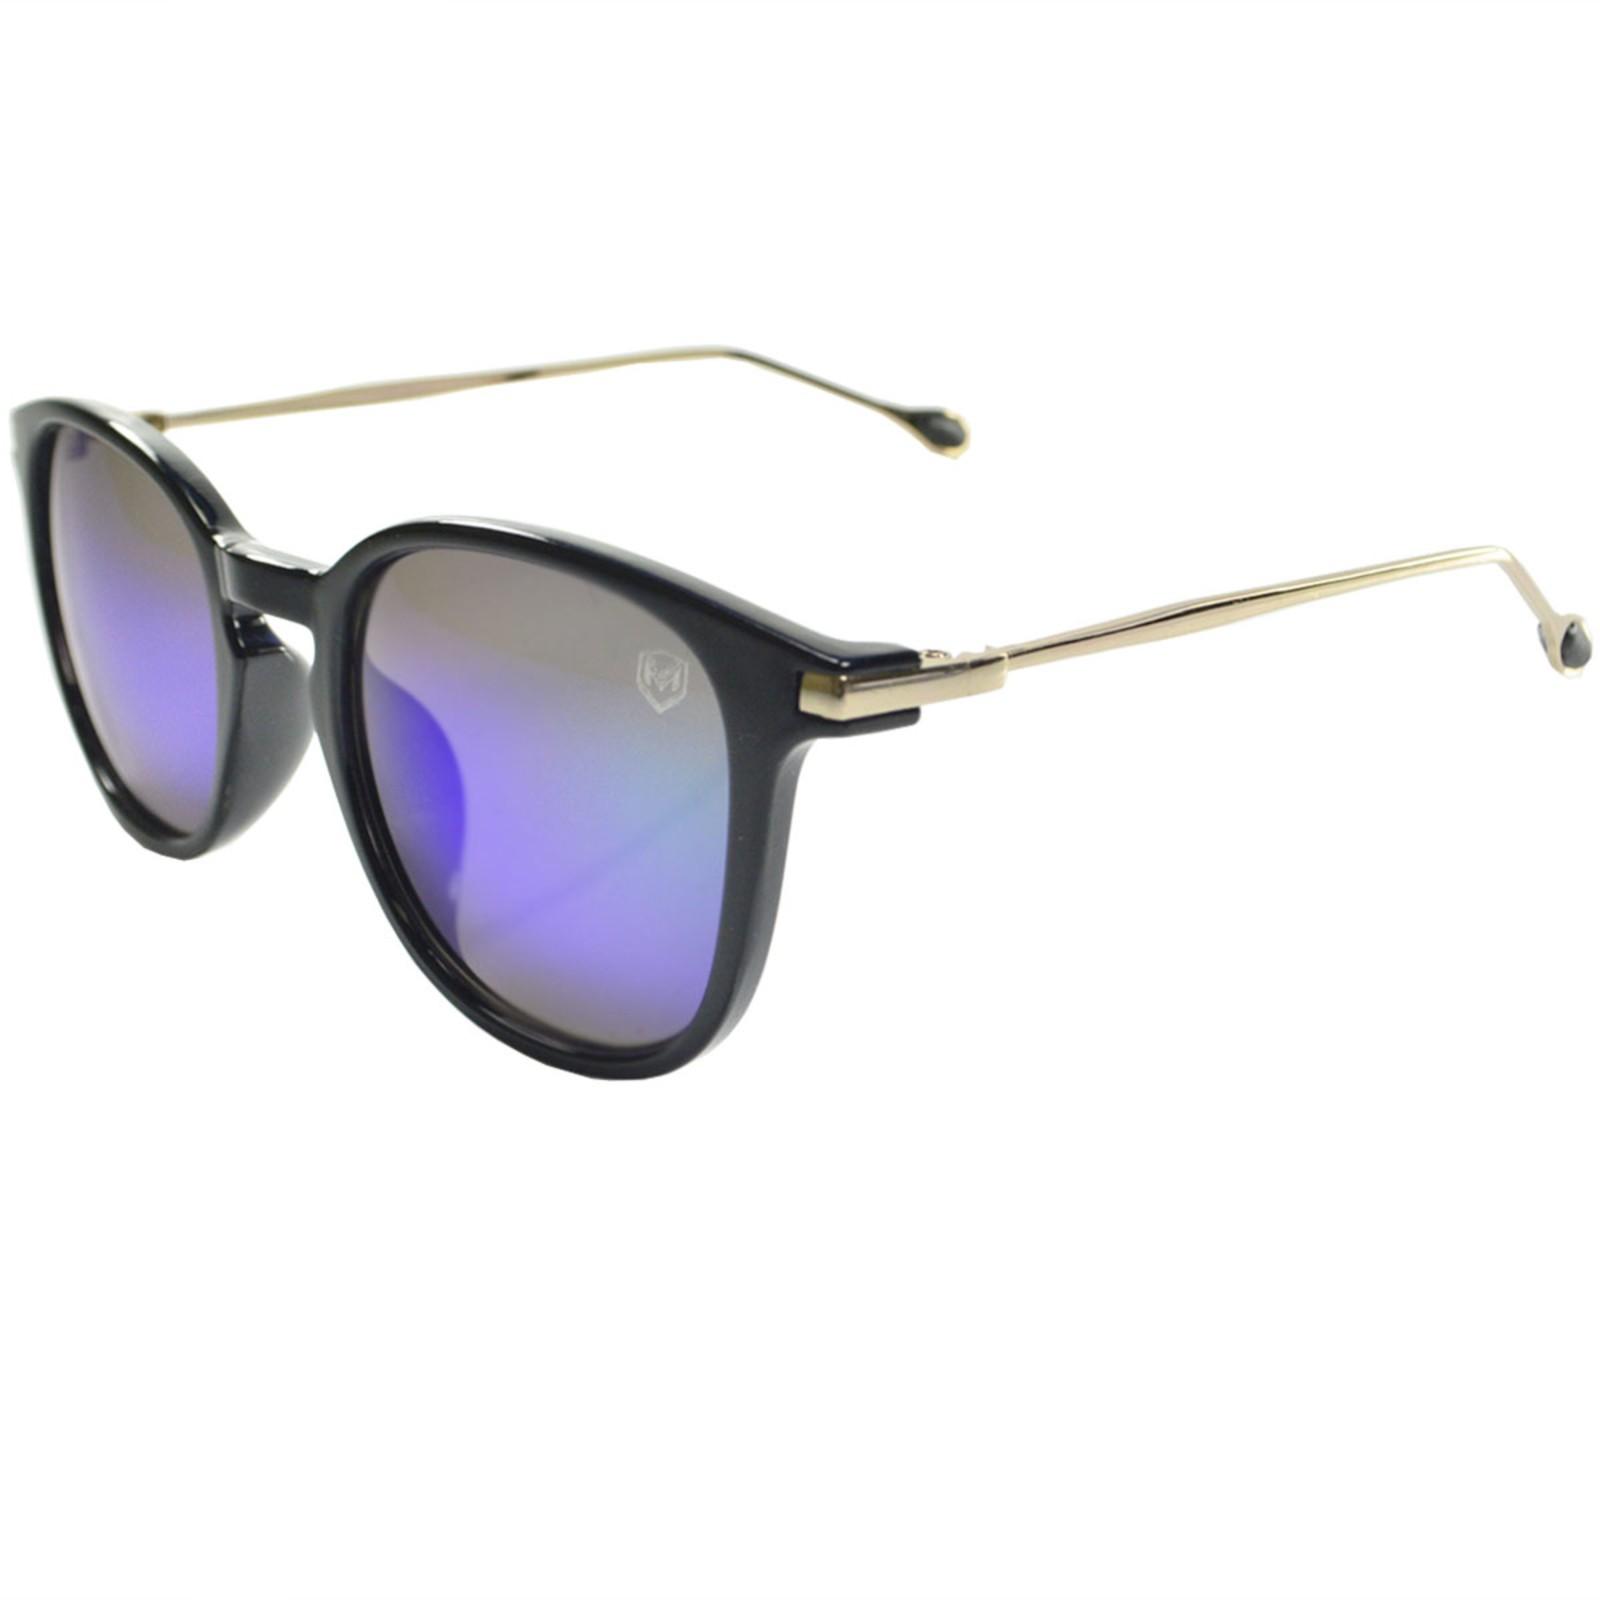 Óculos De Sol Mackage Unissex Acetato/Metal Retangular - Preto/Dourado